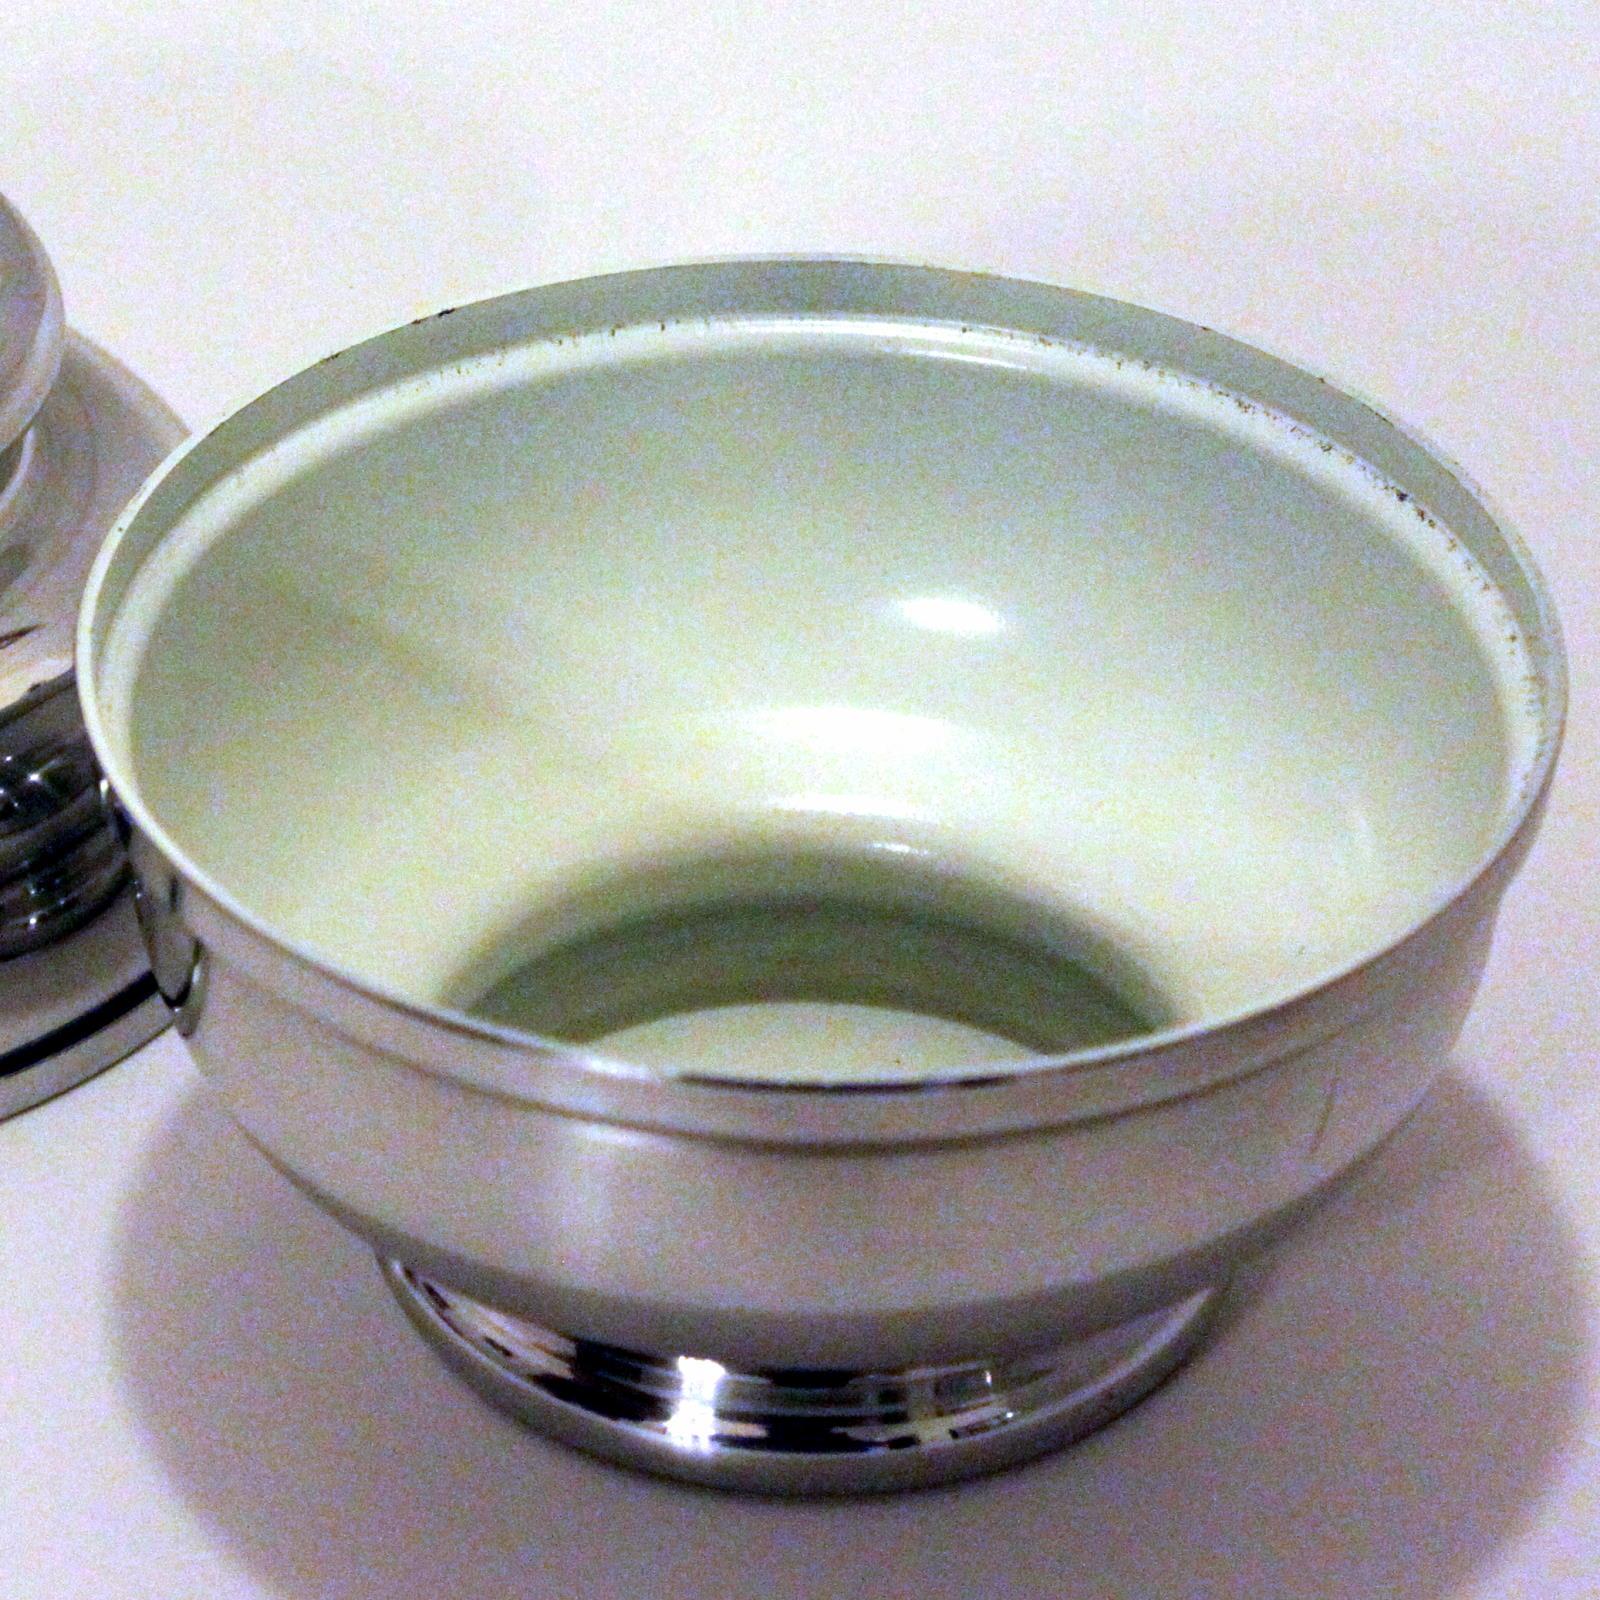 Brahman Rice Bowls - Original RNT by Rings 'N Things Magic Co.